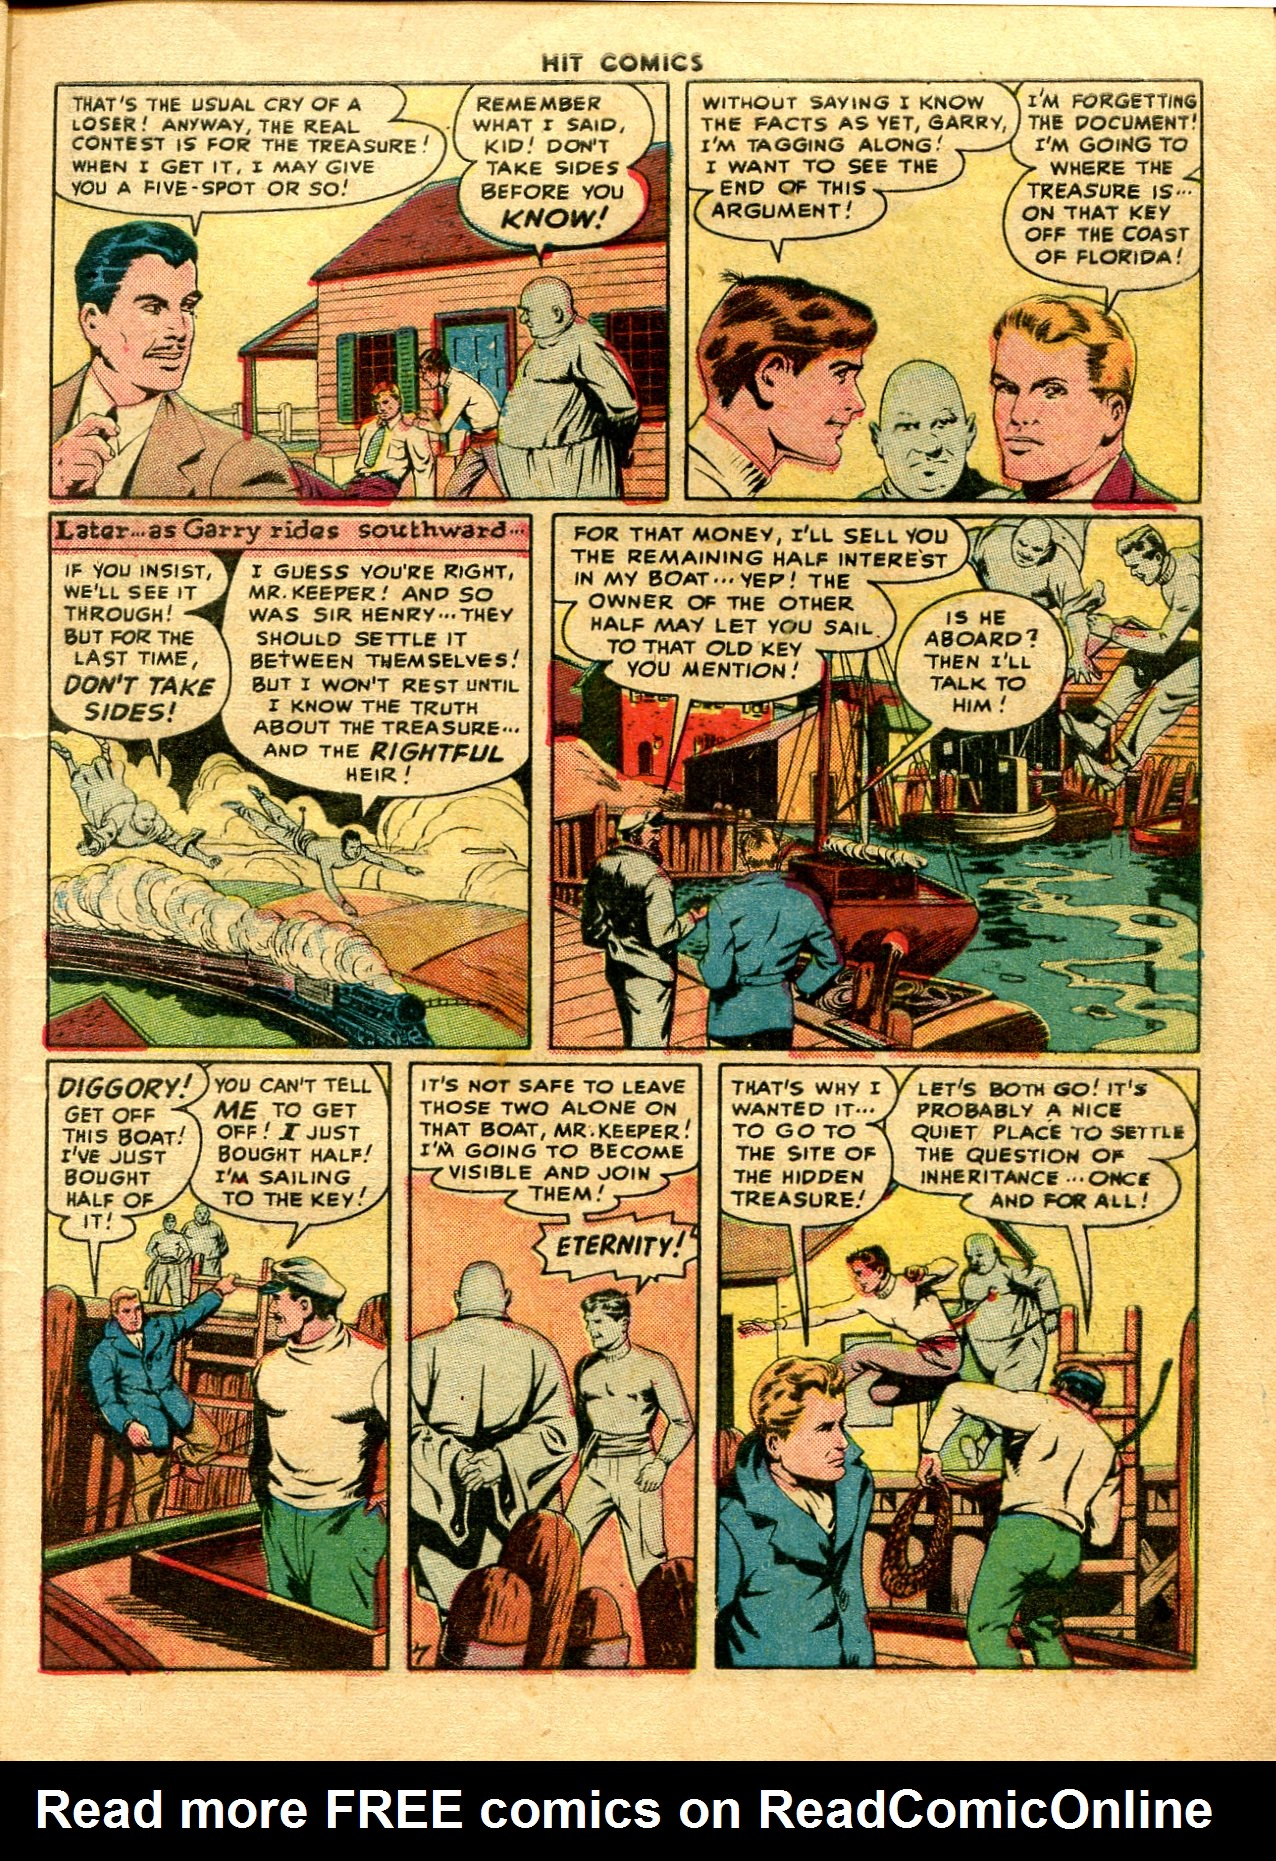 Read online Hit Comics comic -  Issue #48 - 9